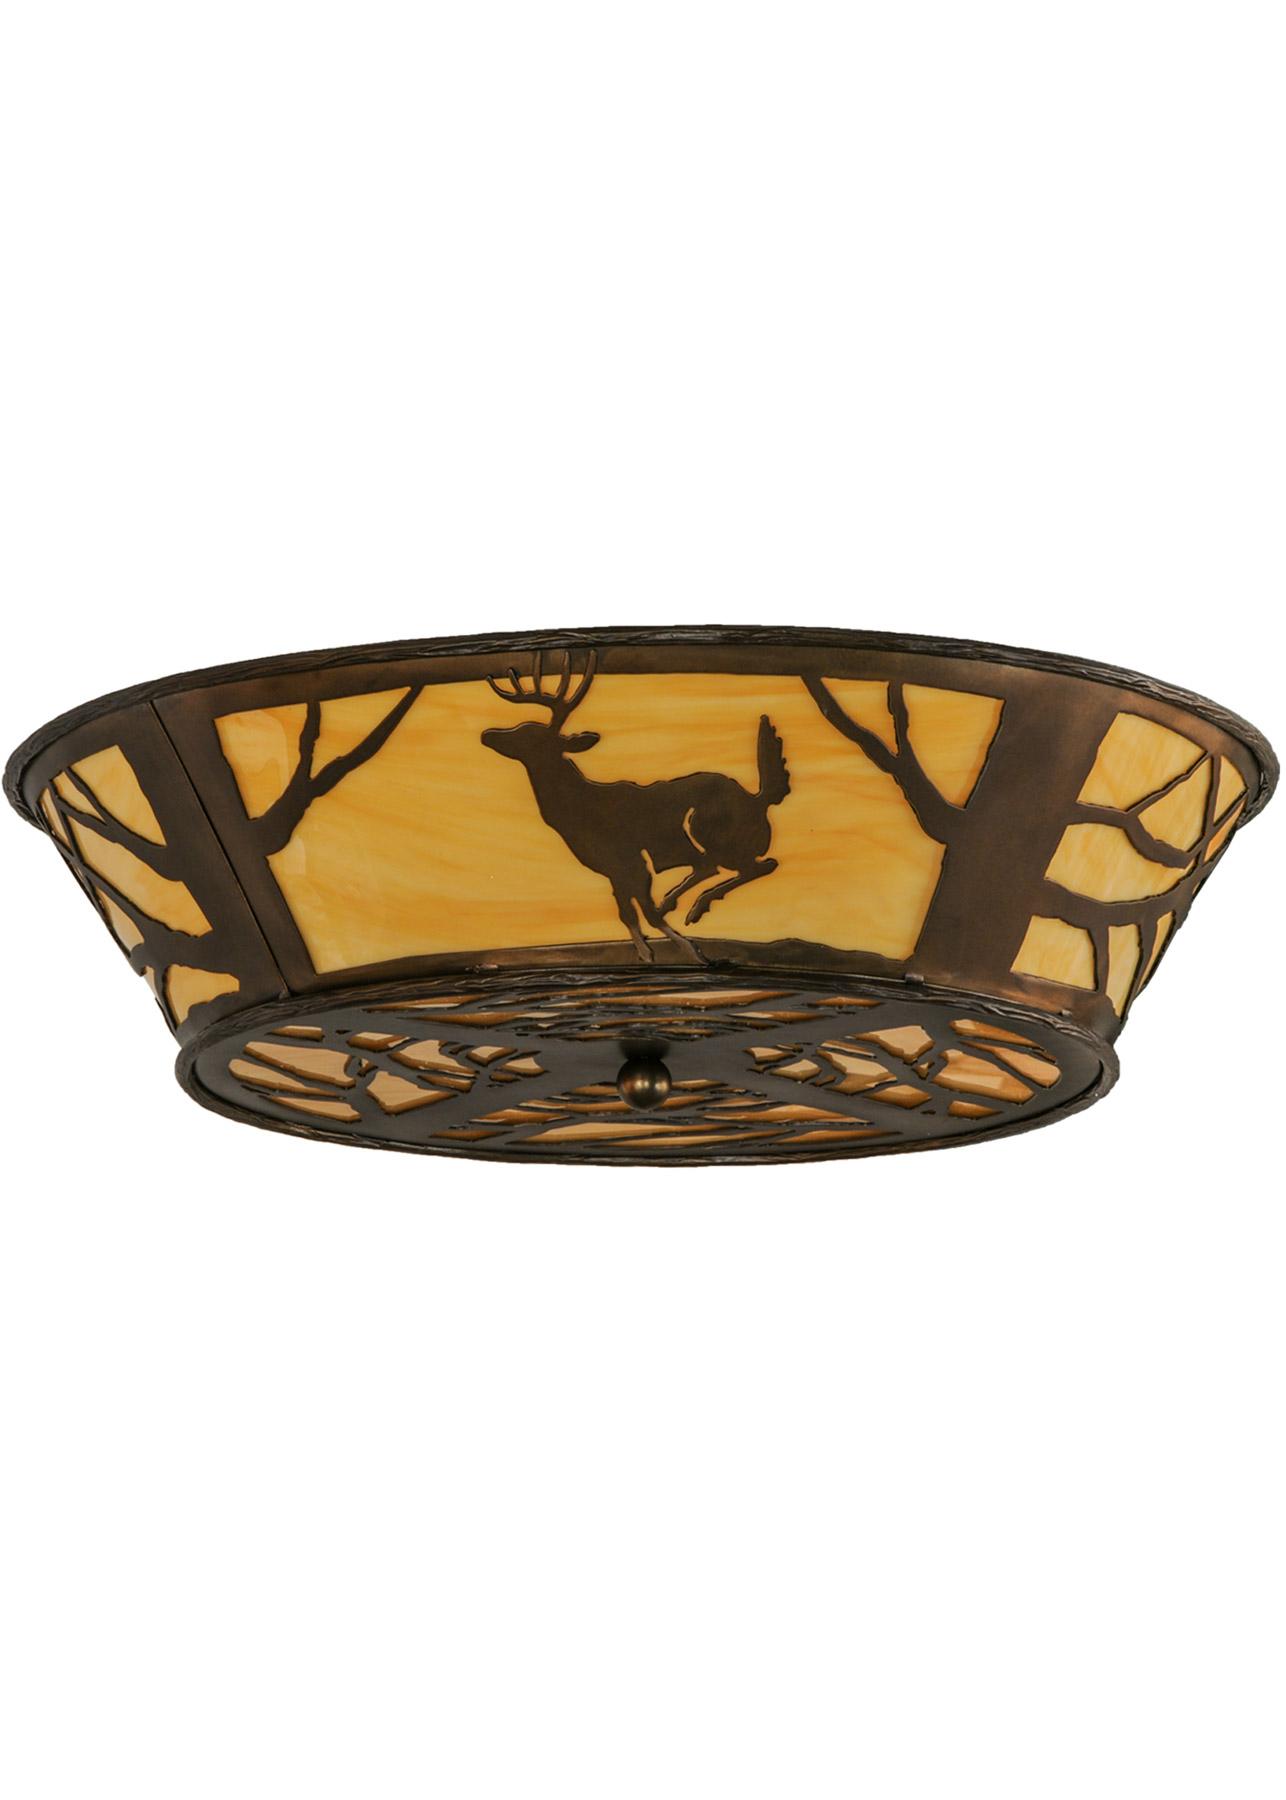 Meyda 145717 Deer On The Loose Flush Mount Ceiling Fixture